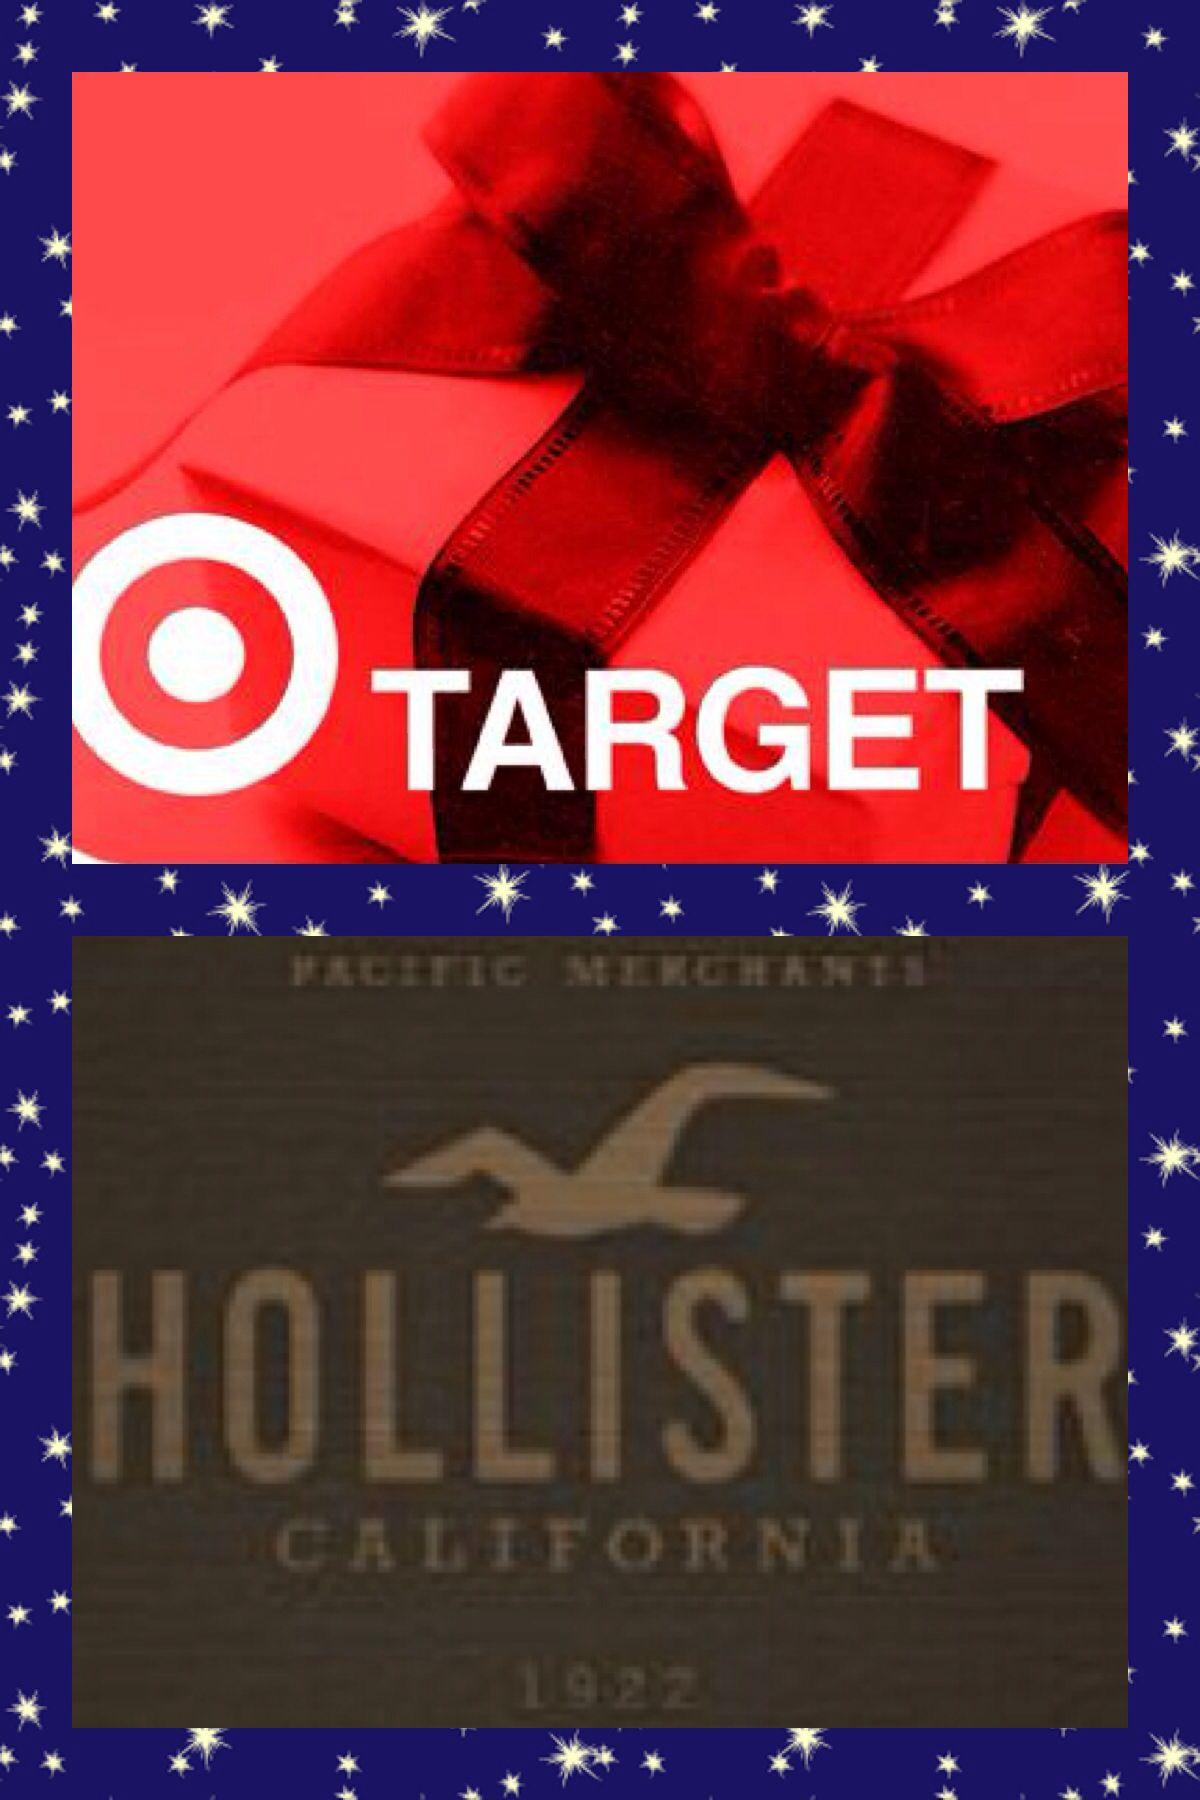 Target hollister gift card hollister gifts gift card